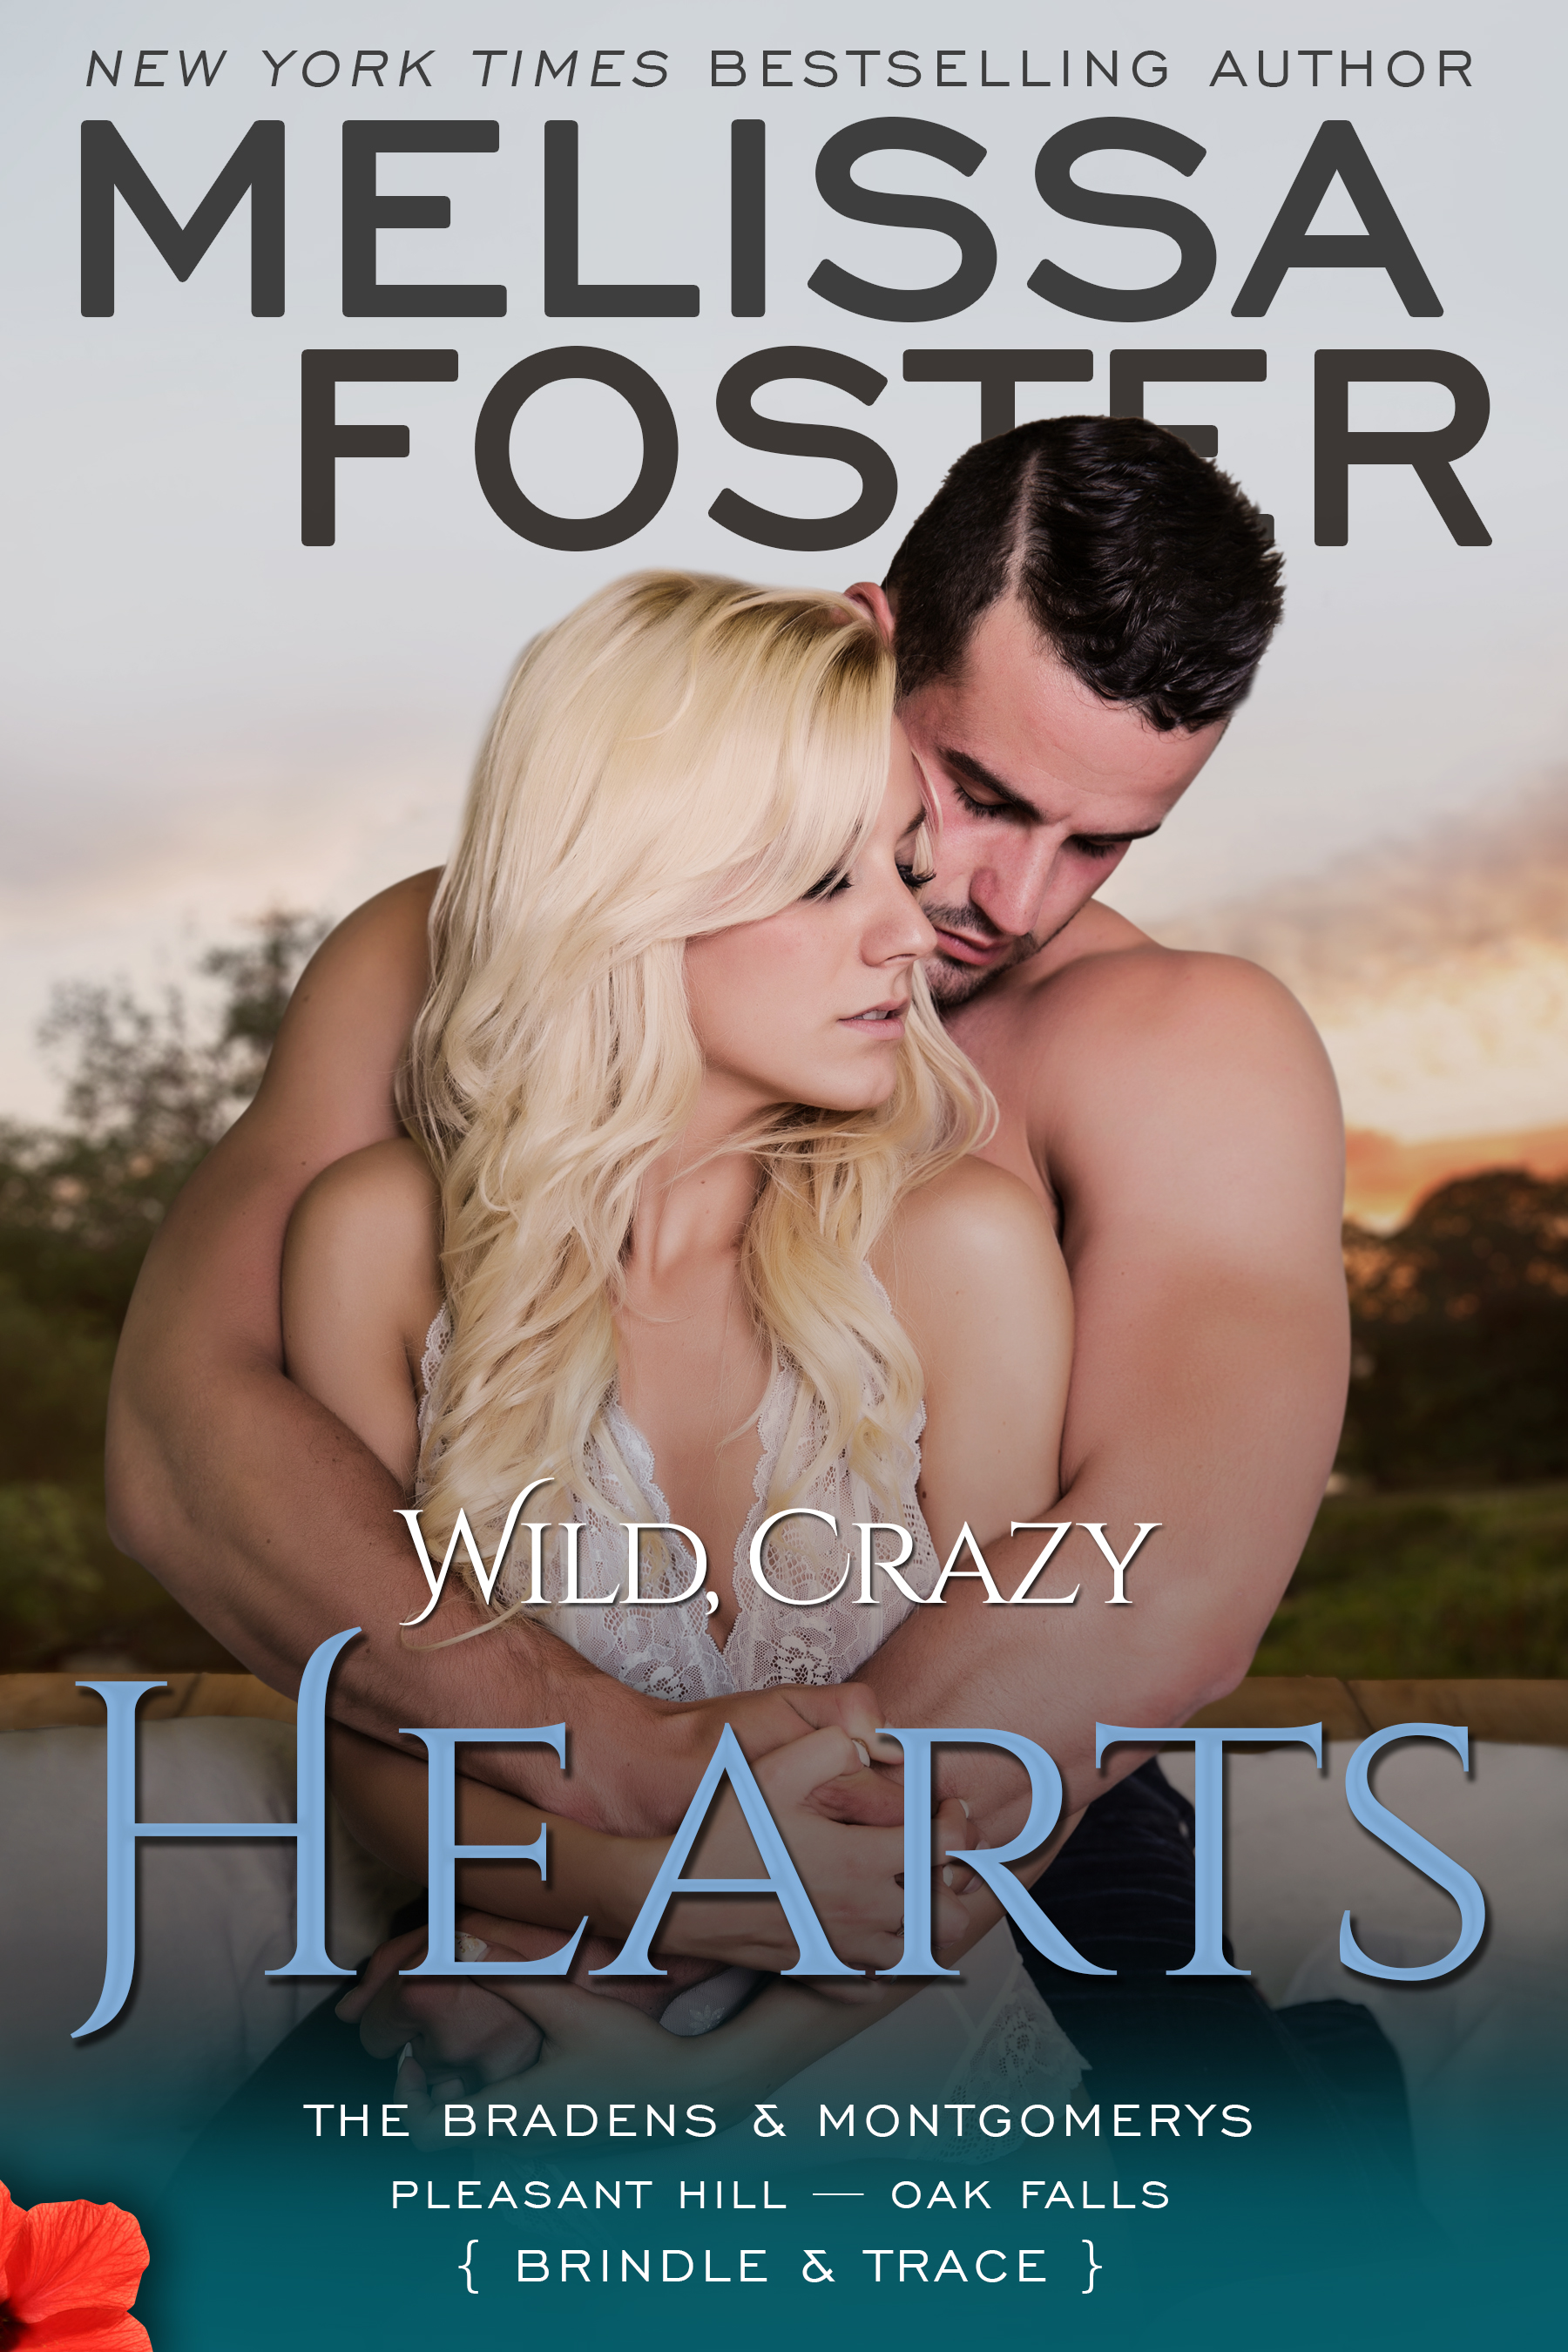 WILD CRAZY HEARTS by Melissa Foster – Release Week Blitz